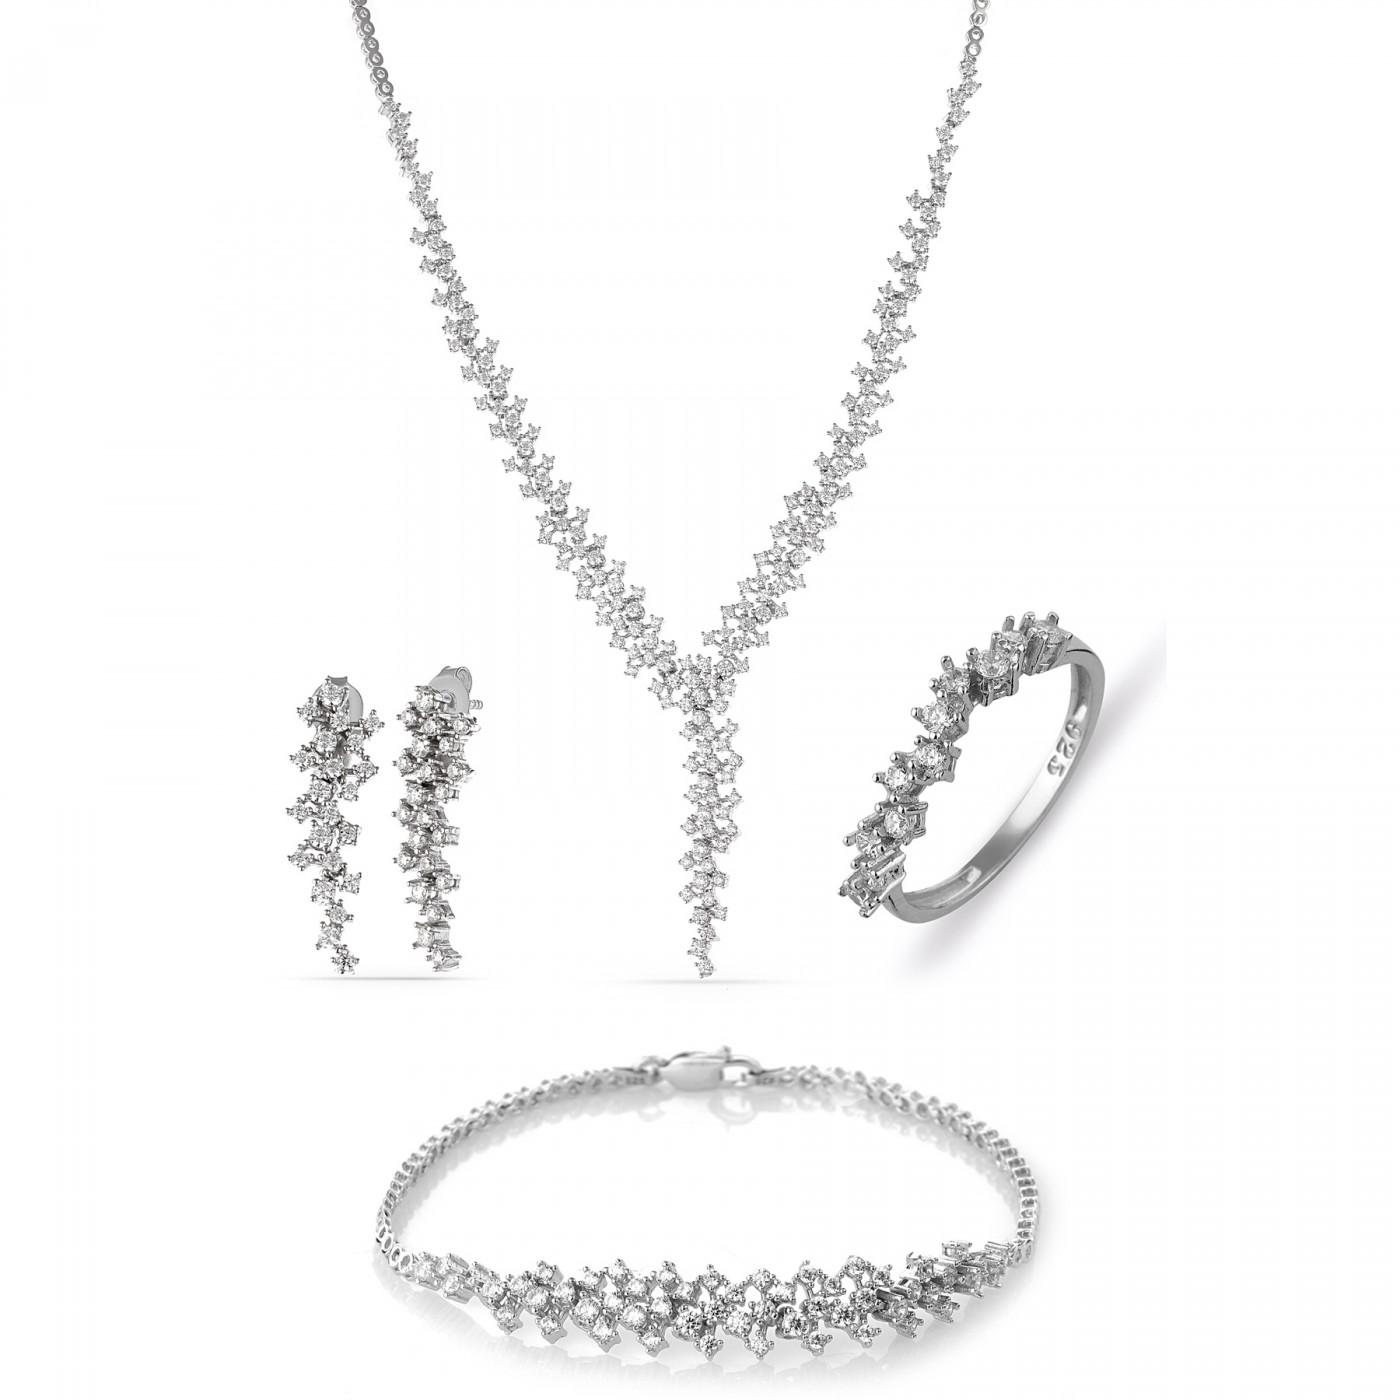 Diamond Model Waterway Silver Set MYS0060 | mysilvers